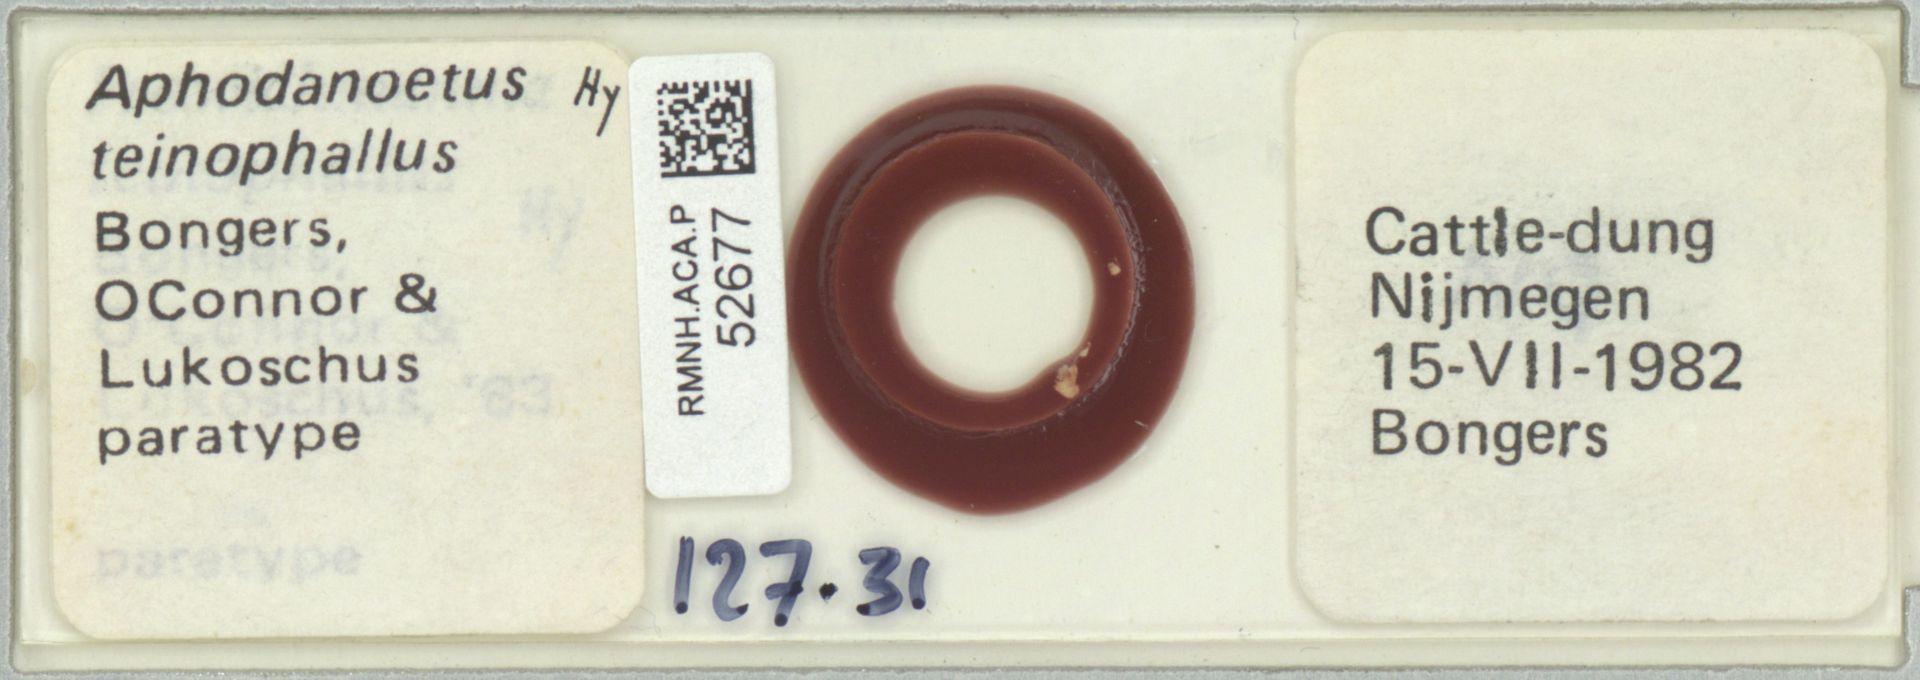 RMNH.ACA.P.52677 | Aphodanoetus teinophallus Bongers, OConnor & Lukoschus